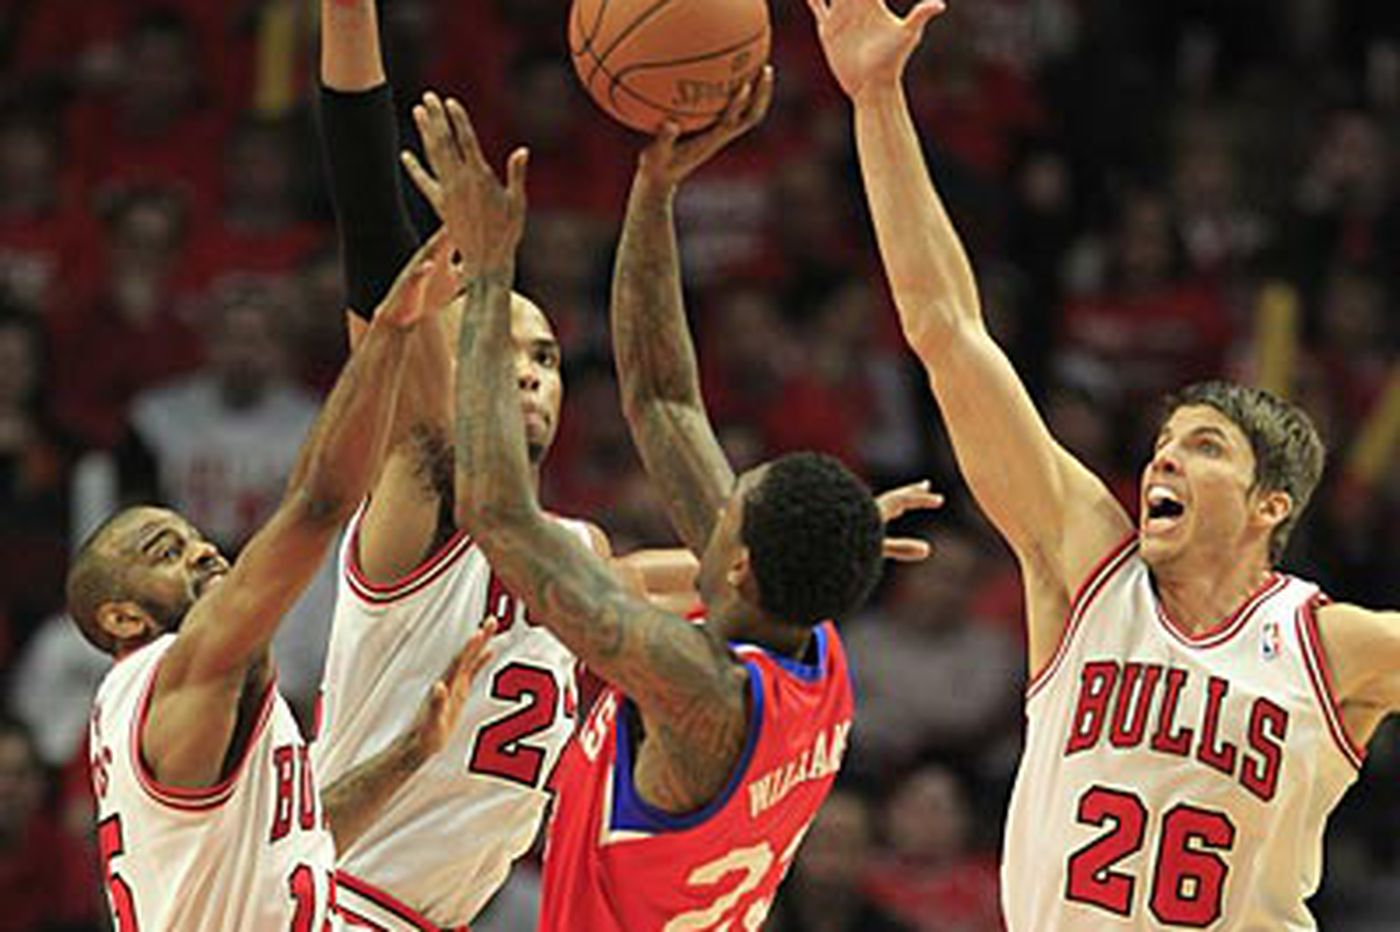 Bulls determined to regain tough defense